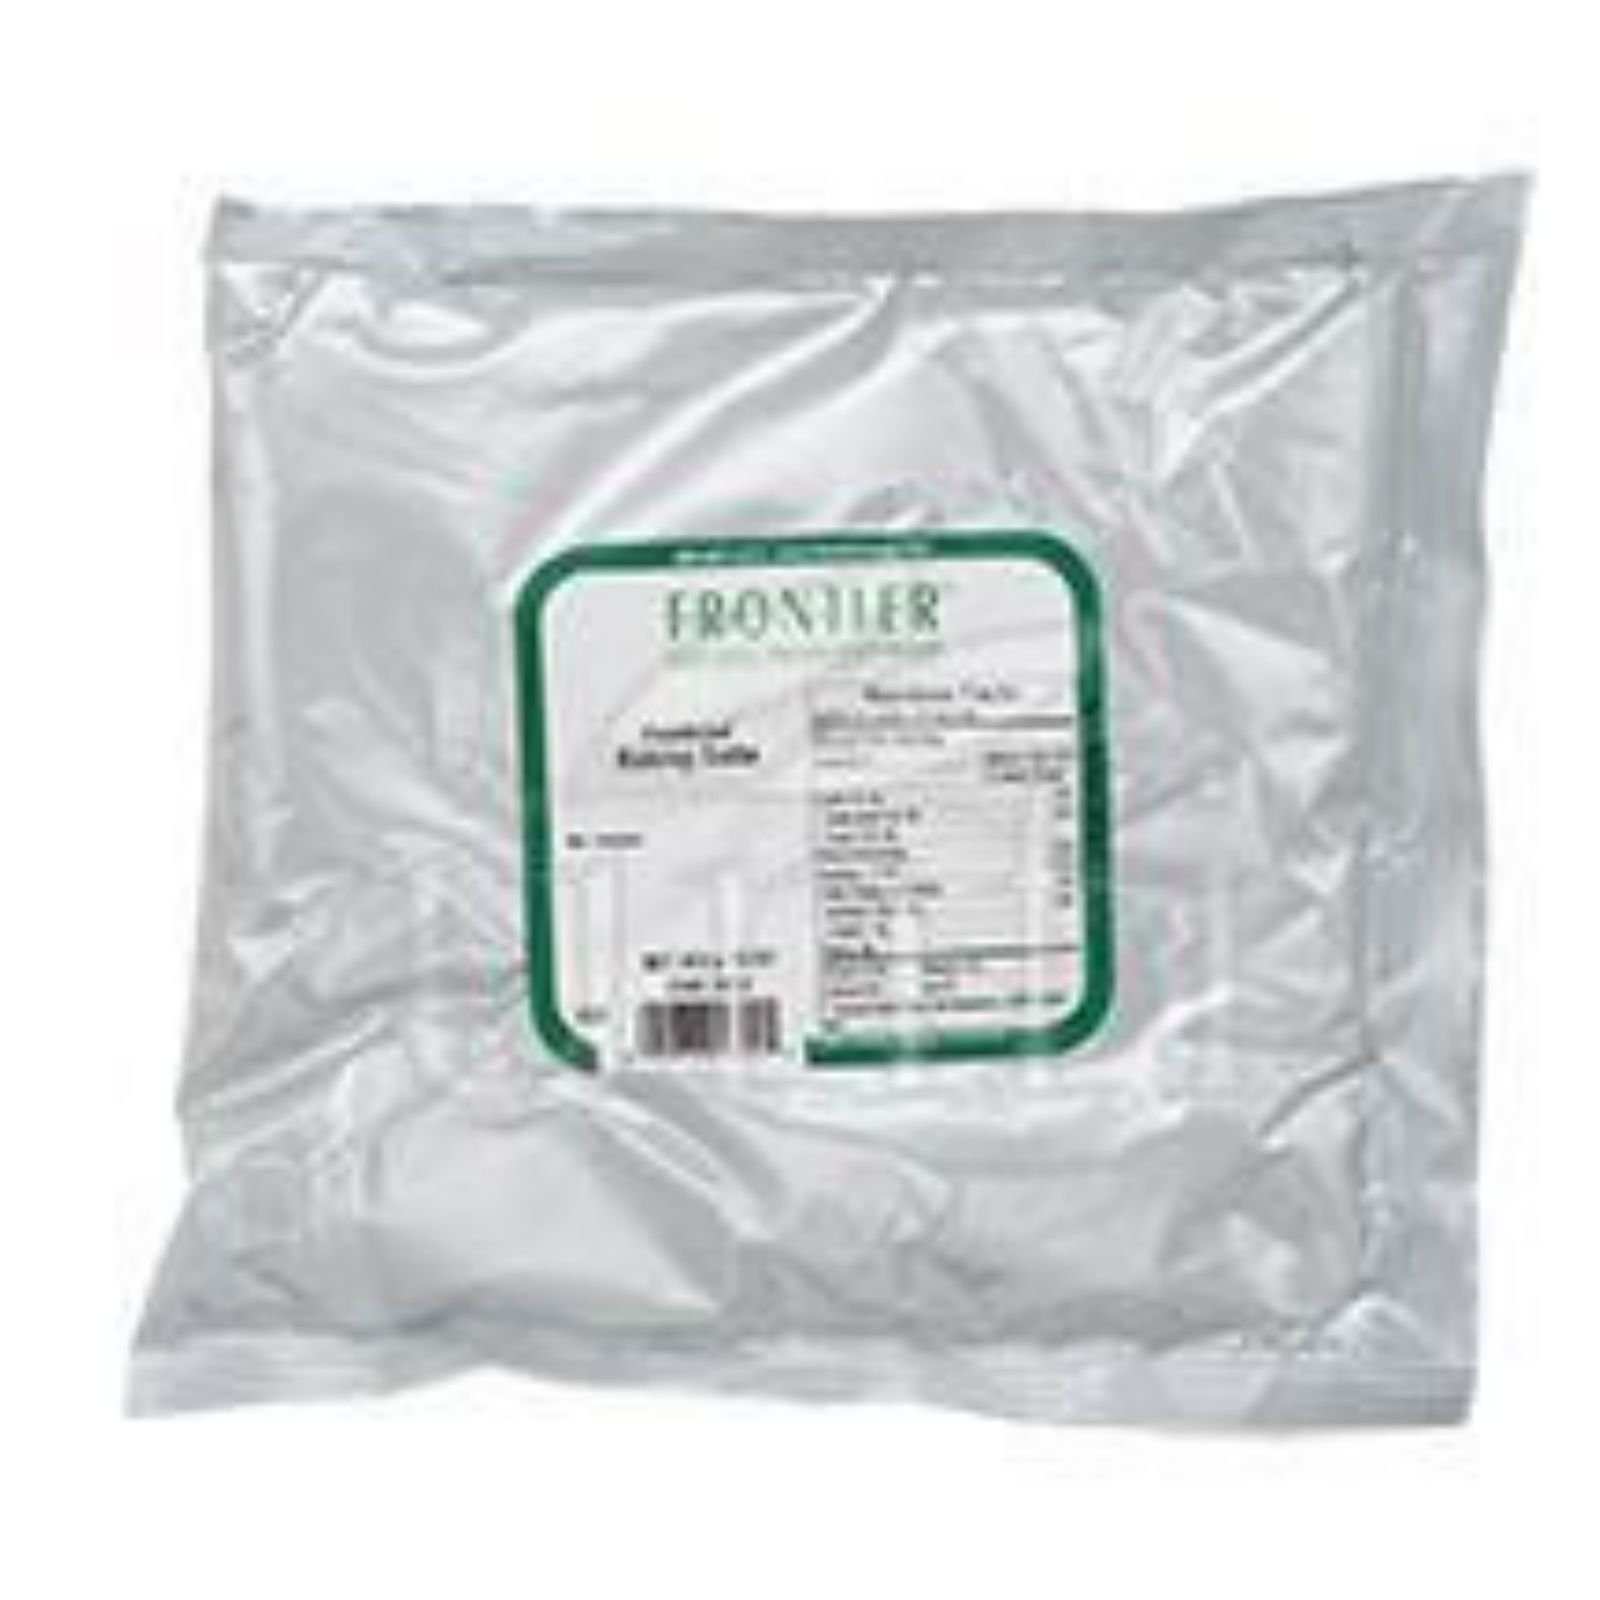 Frontier Herb Baking Soda Powder - Bulk - 1 lb - Highest quality - USP grade No. 1 -